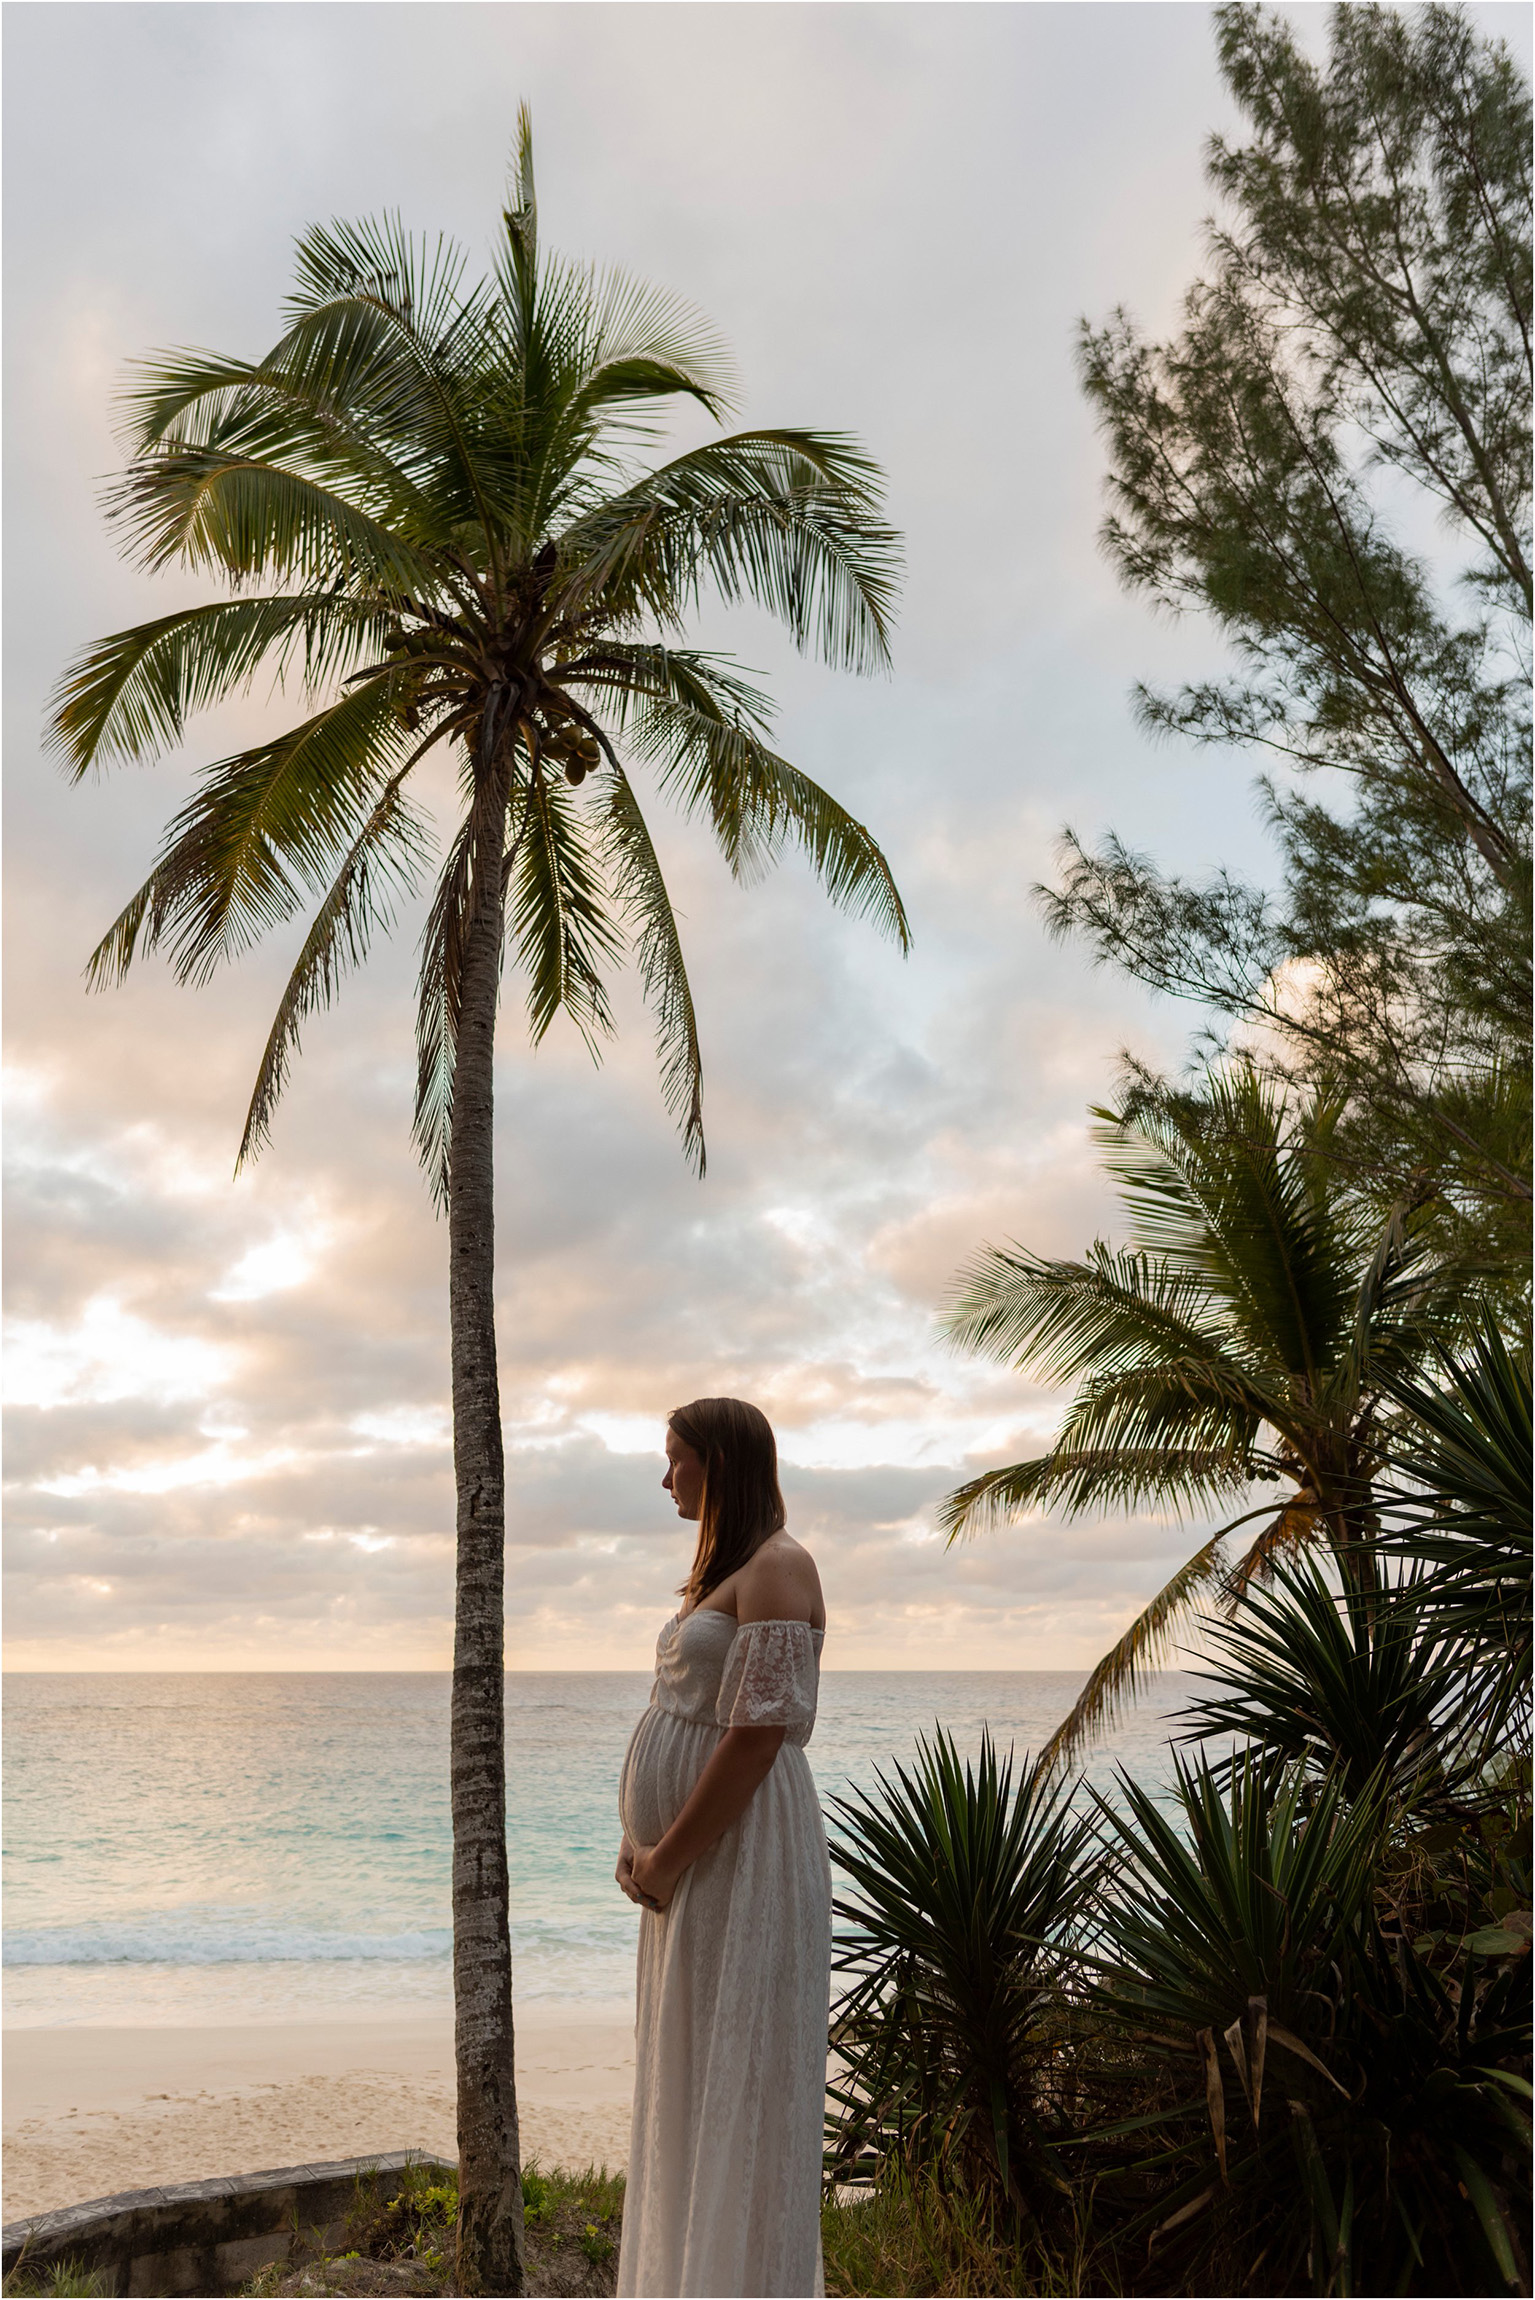 ©FianderFoto_Bermuda Maternity Photographer_Betsy_004.jpg